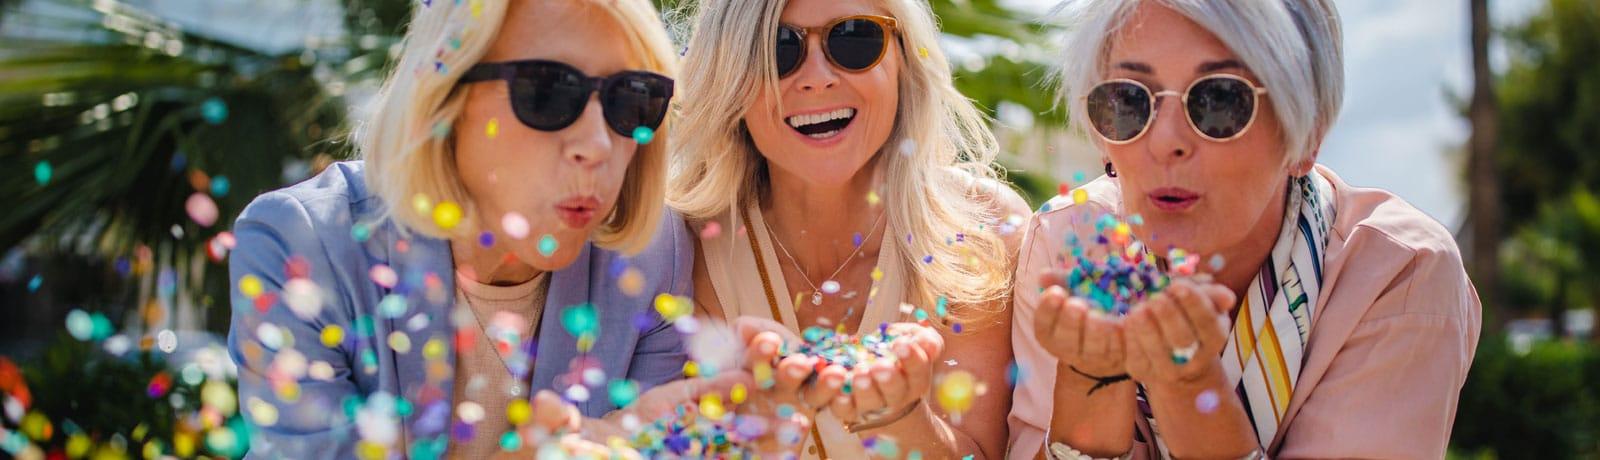 three women blowing confetti